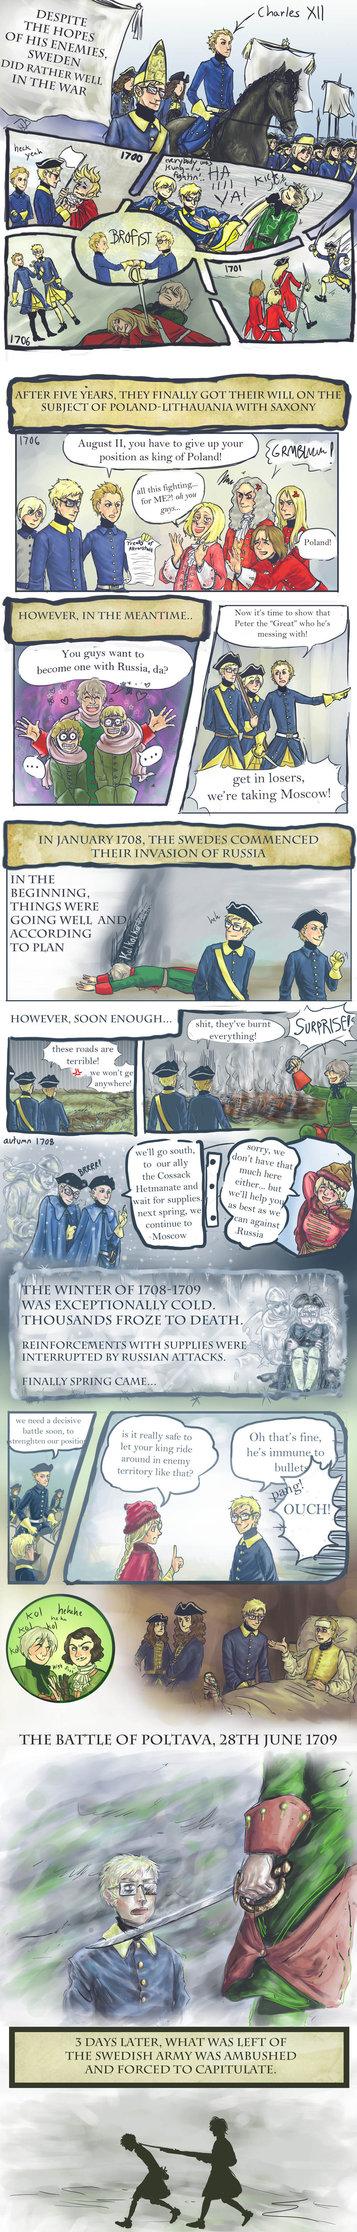 EotSE part 3: going to war bitches! by Sildesalaten